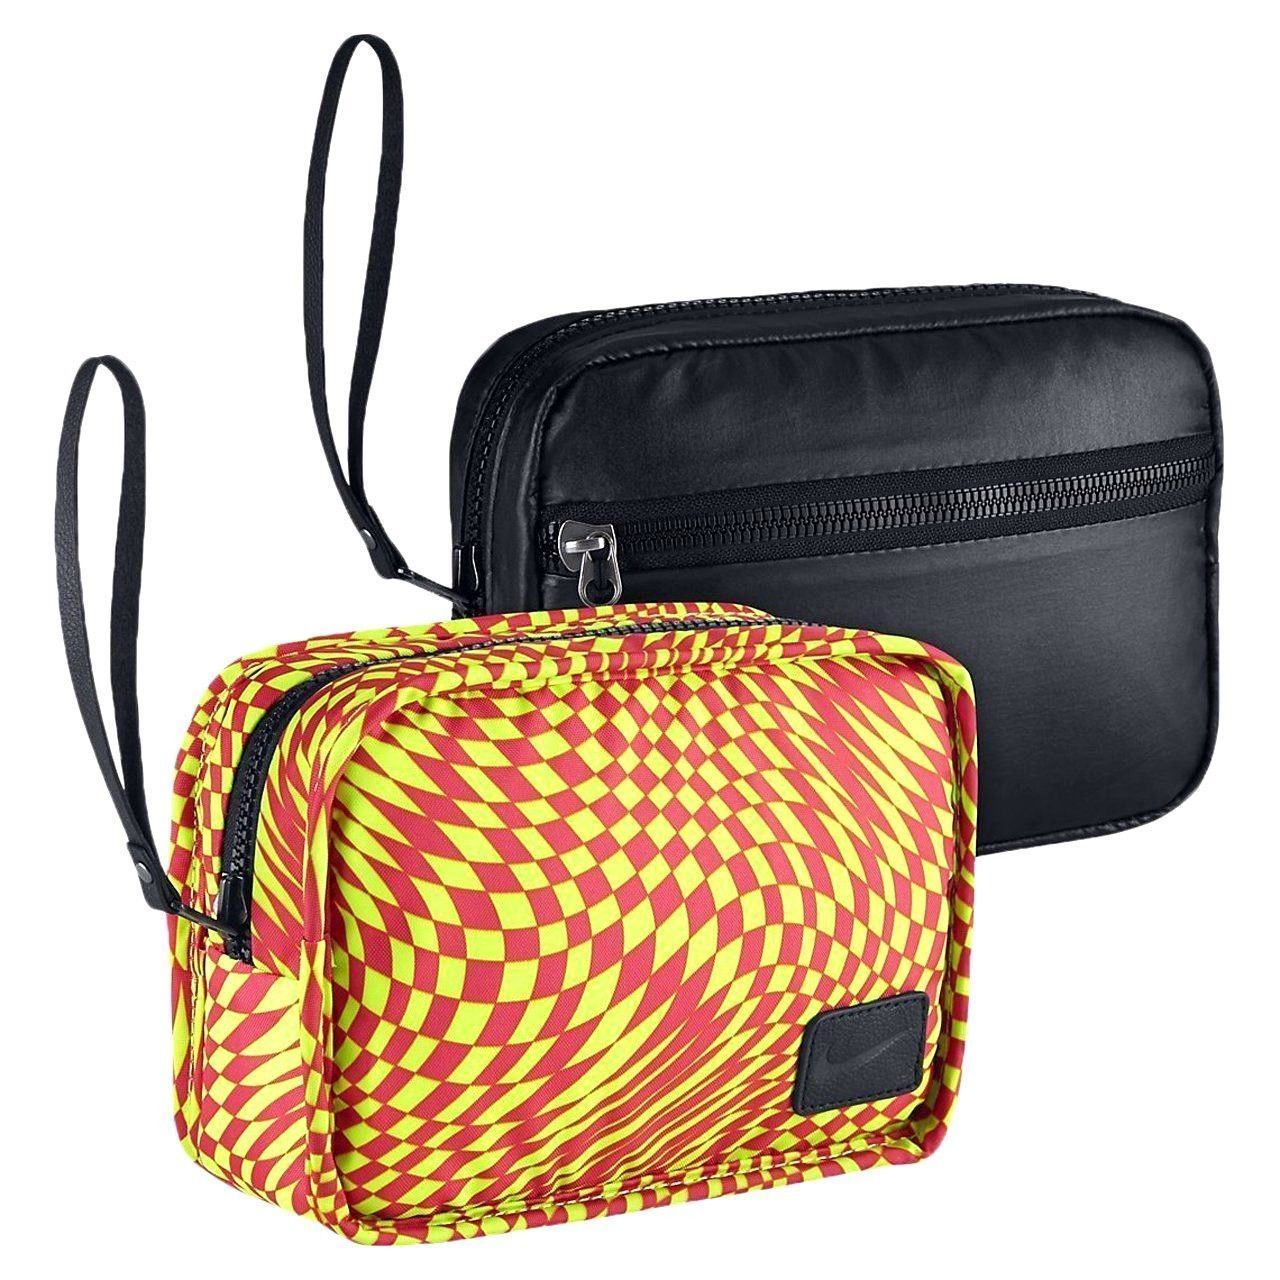 Nike Studio Reversible Kit 2.0 Bag BA5122 001 Black Volt Pink